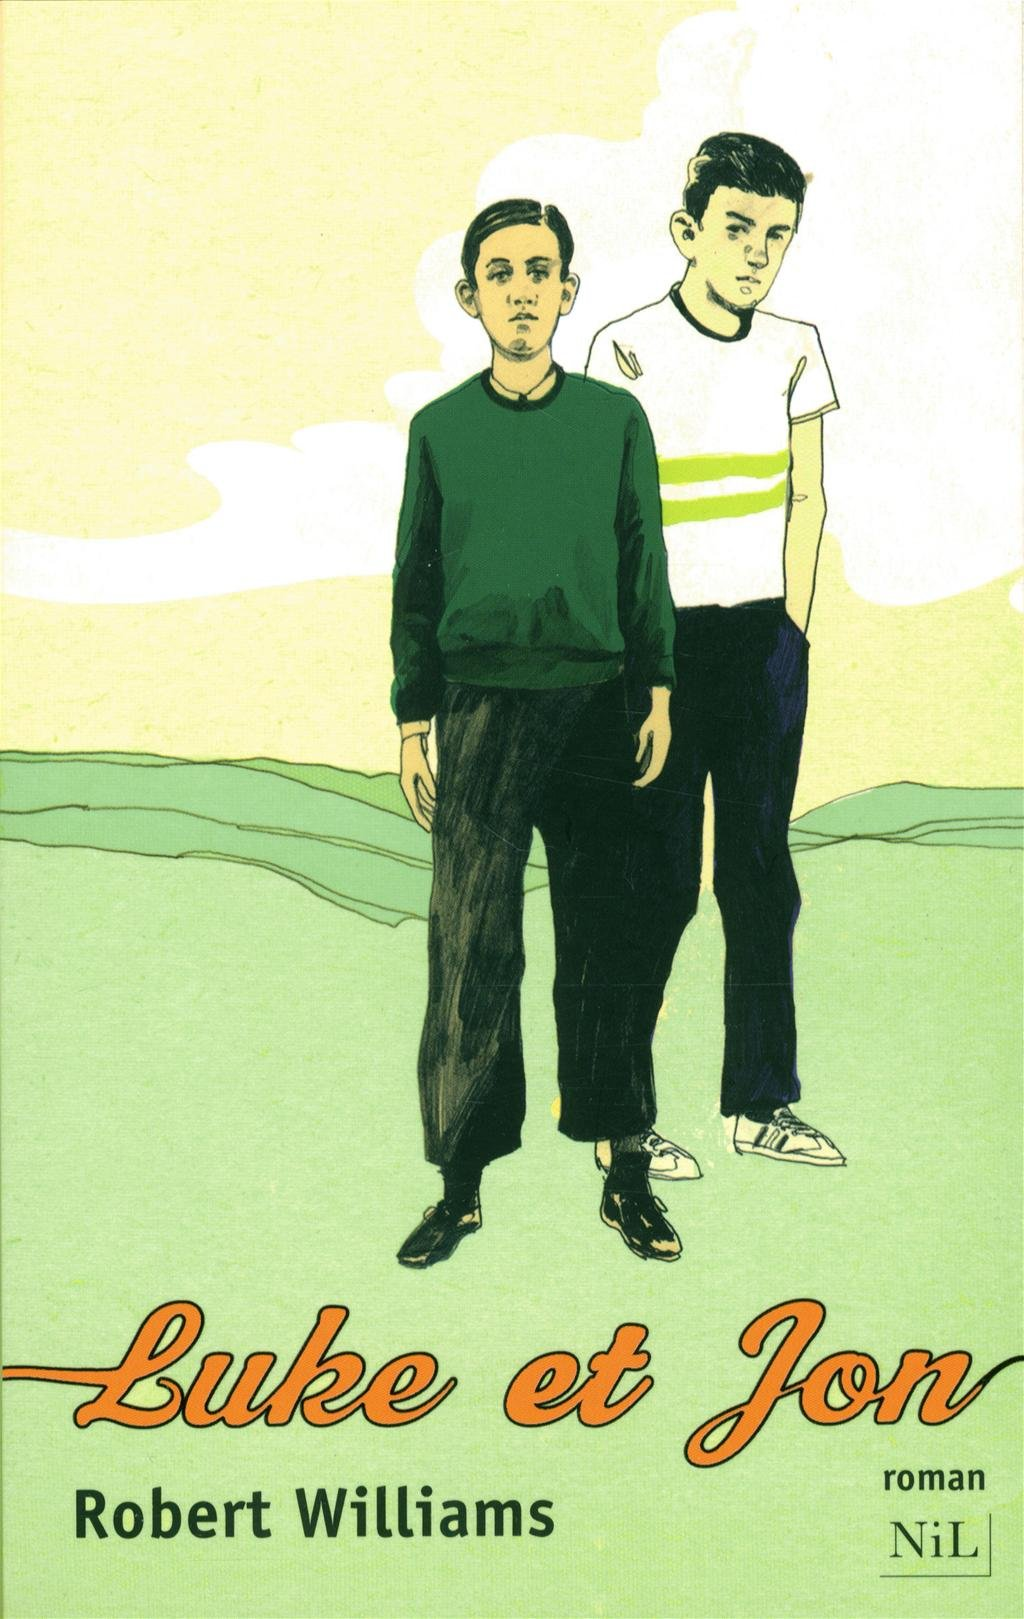 Luke et Jon - Robert Williams - Nil éditions